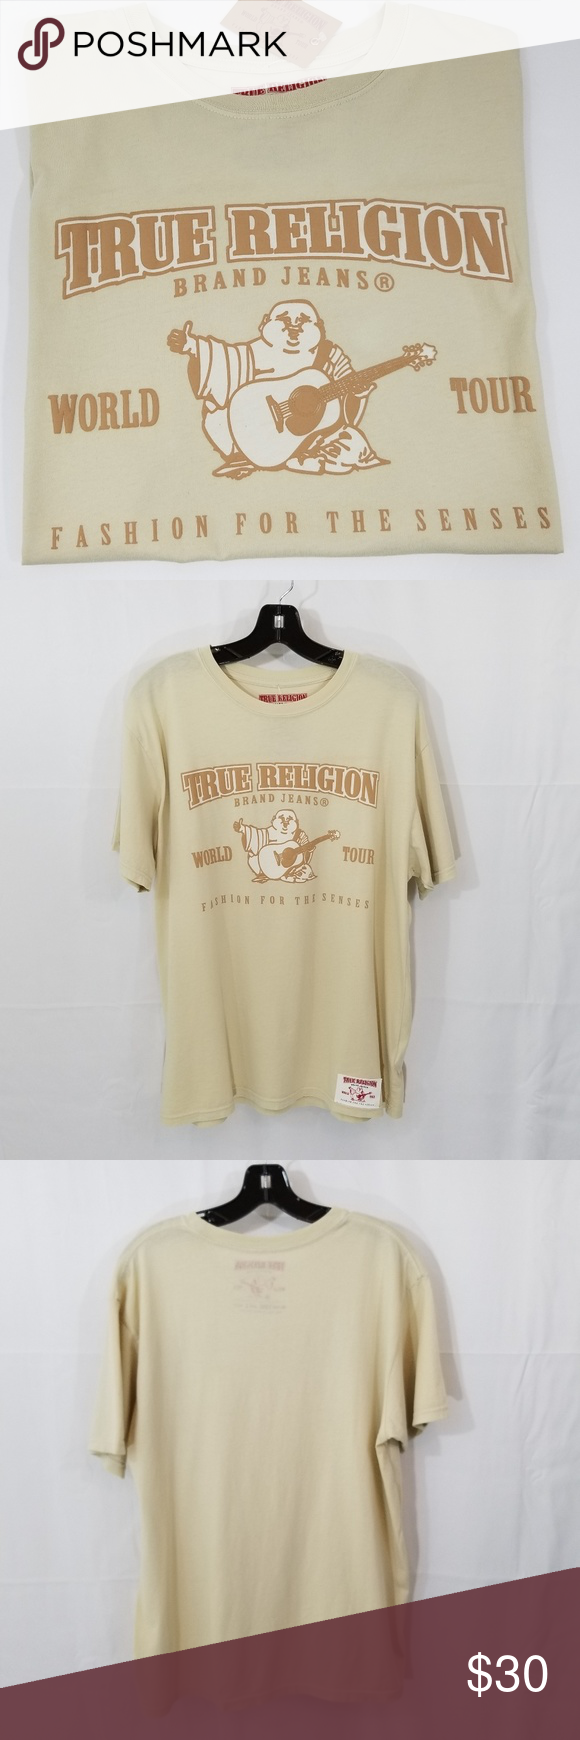 42bf195e876 TRUE RELIGION Mens T-Shirt Graphic Tee Tan New Lg Men s Authentic True  Religion T